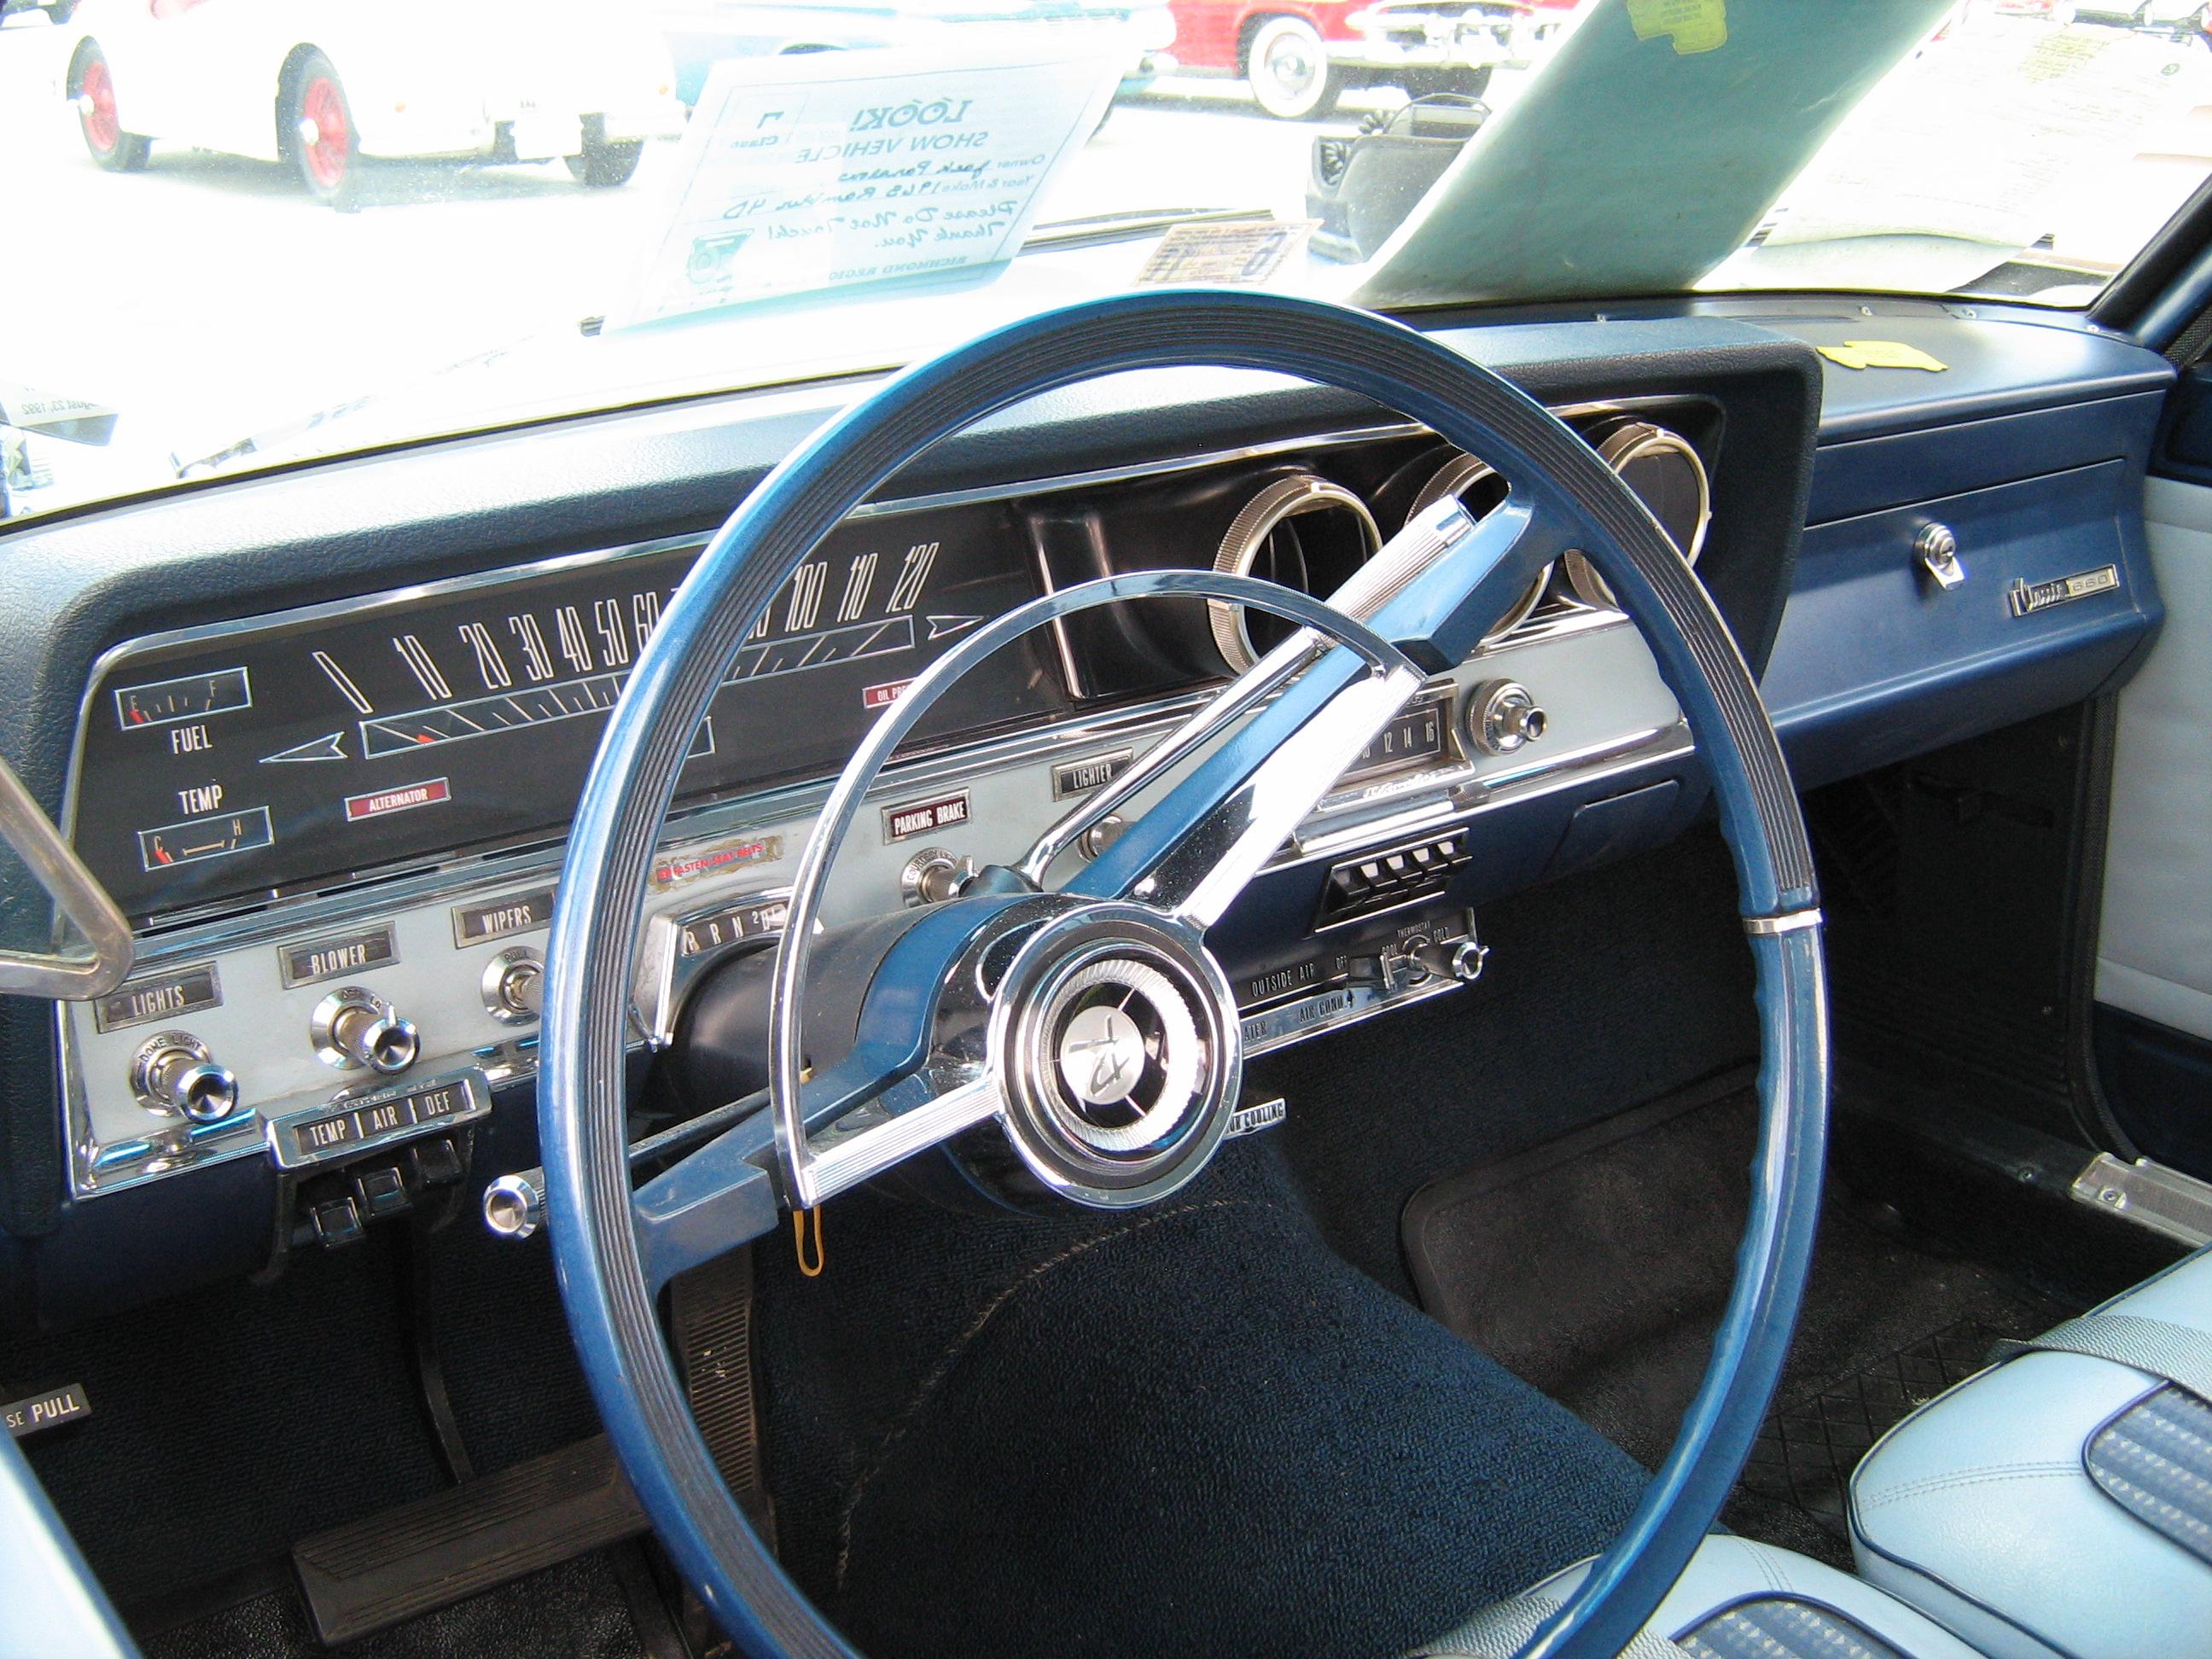 New Car Radio No Sound